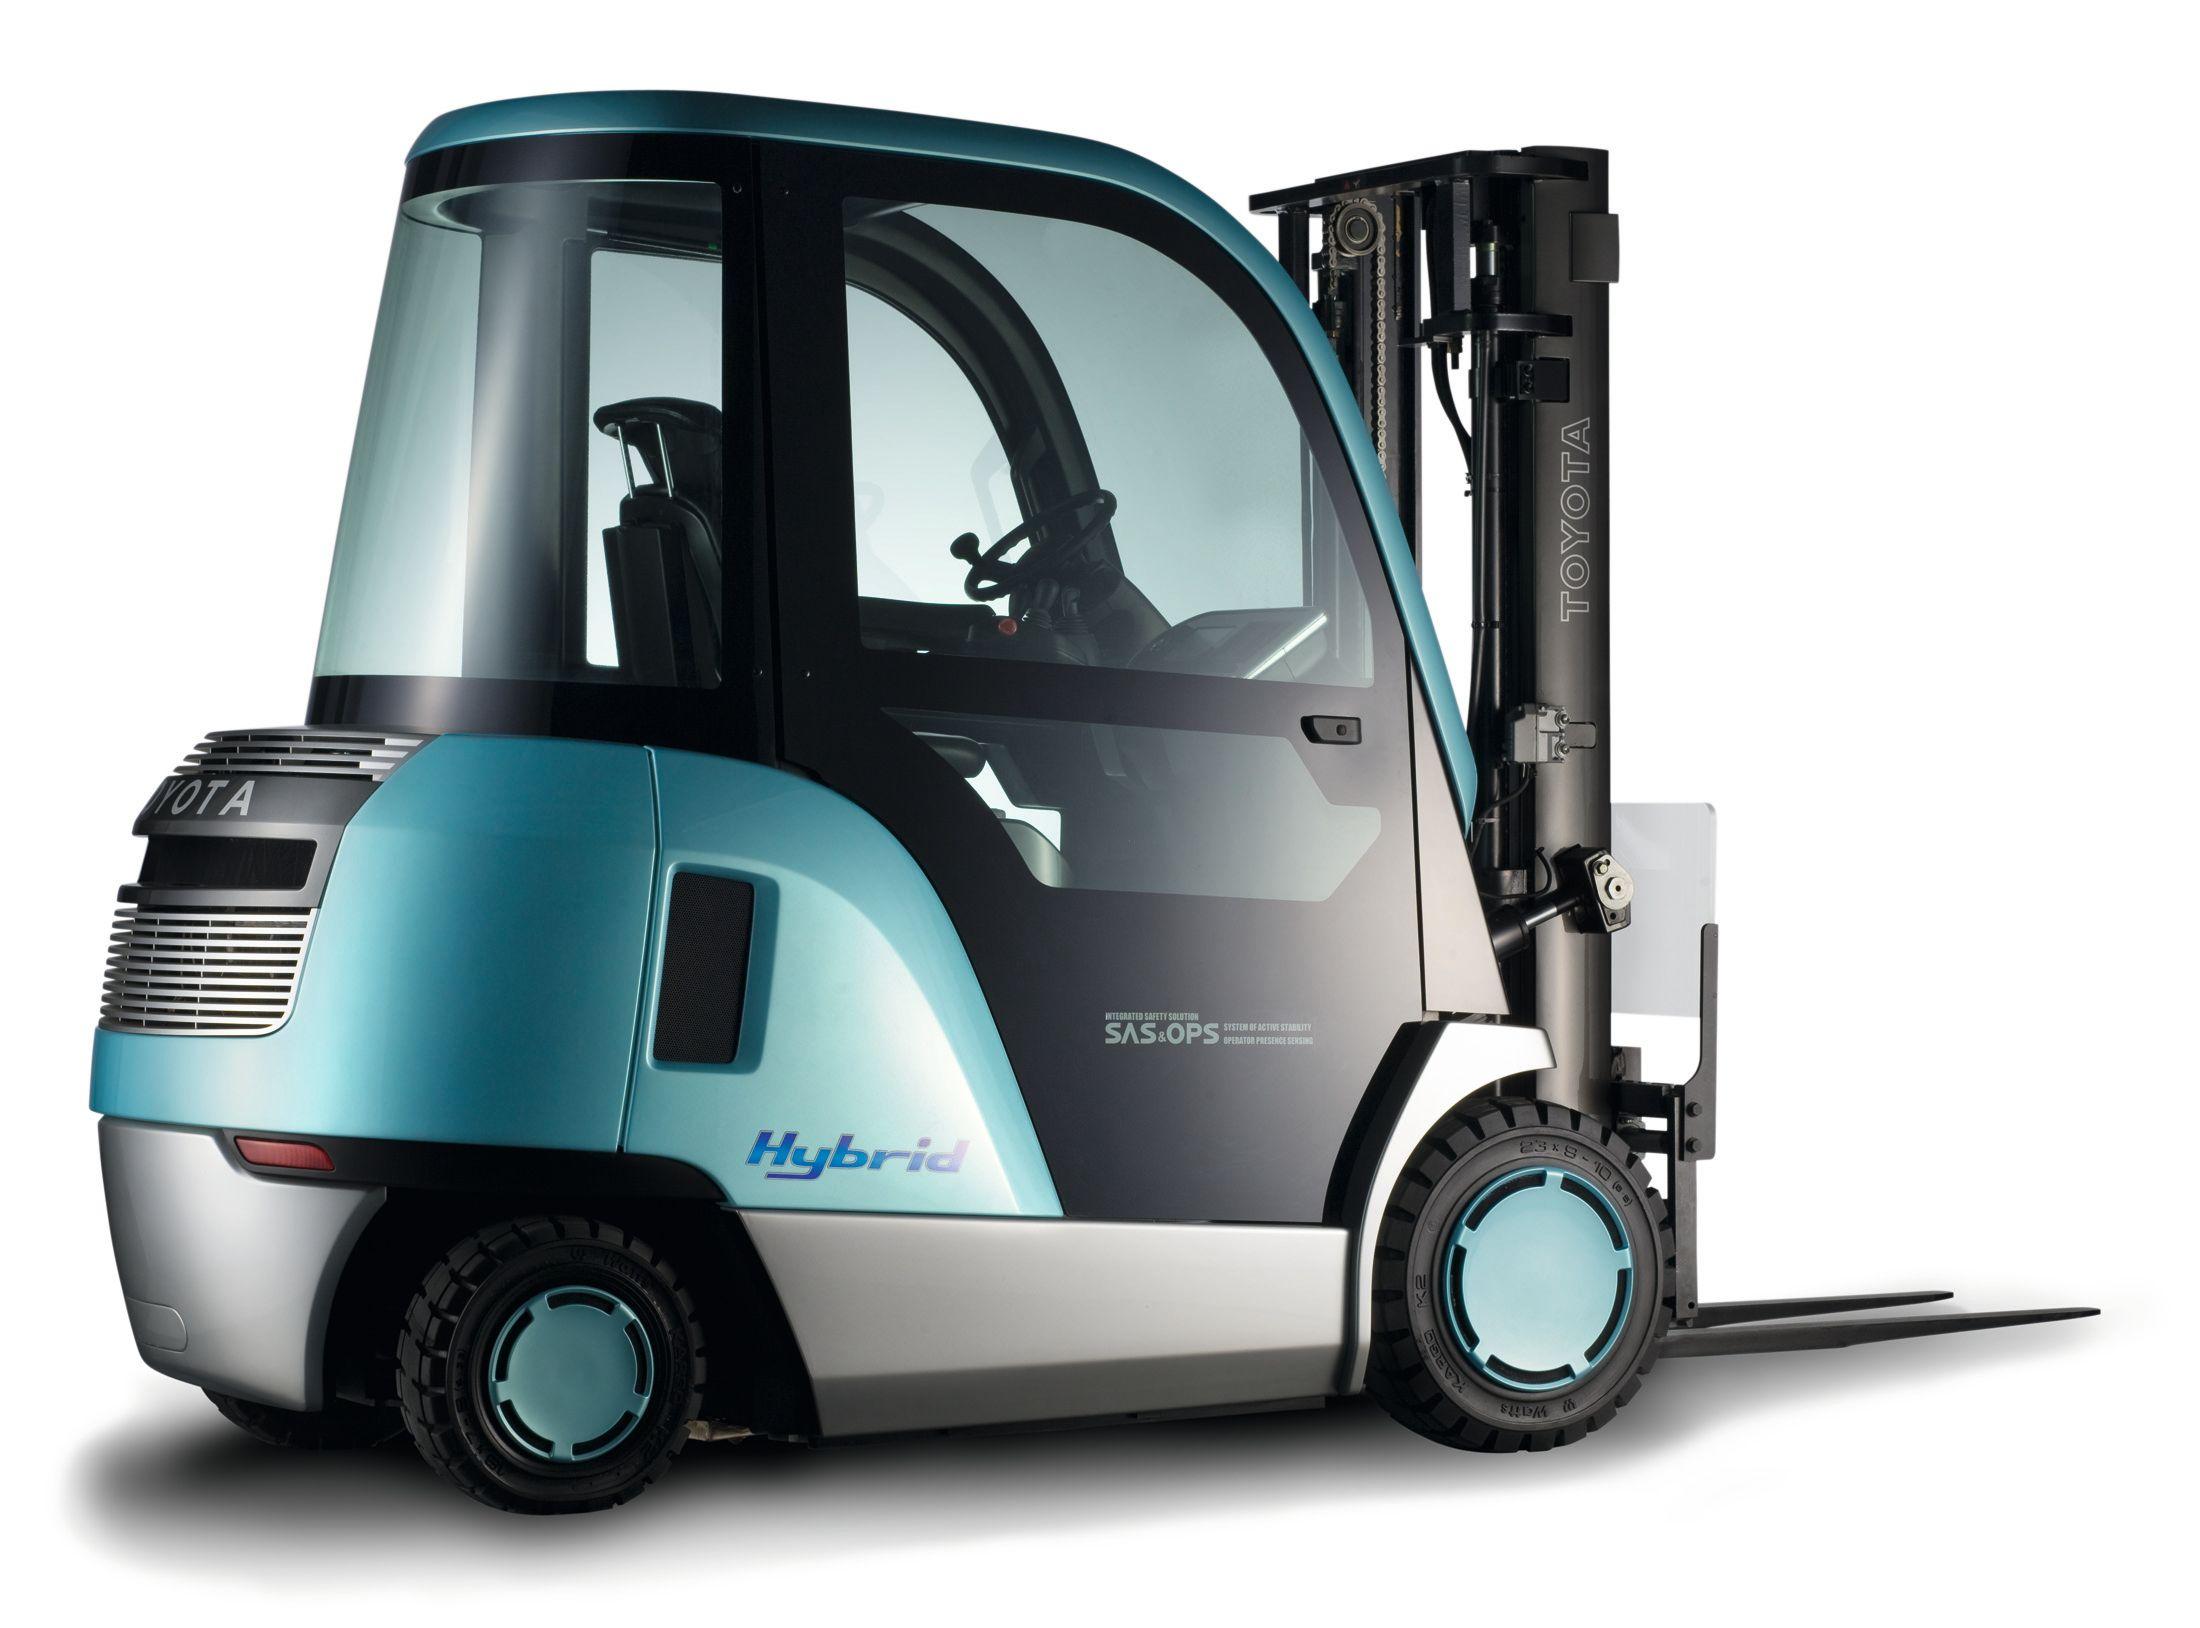 Hybrid Forklift Toyota Forklifts Pinterest